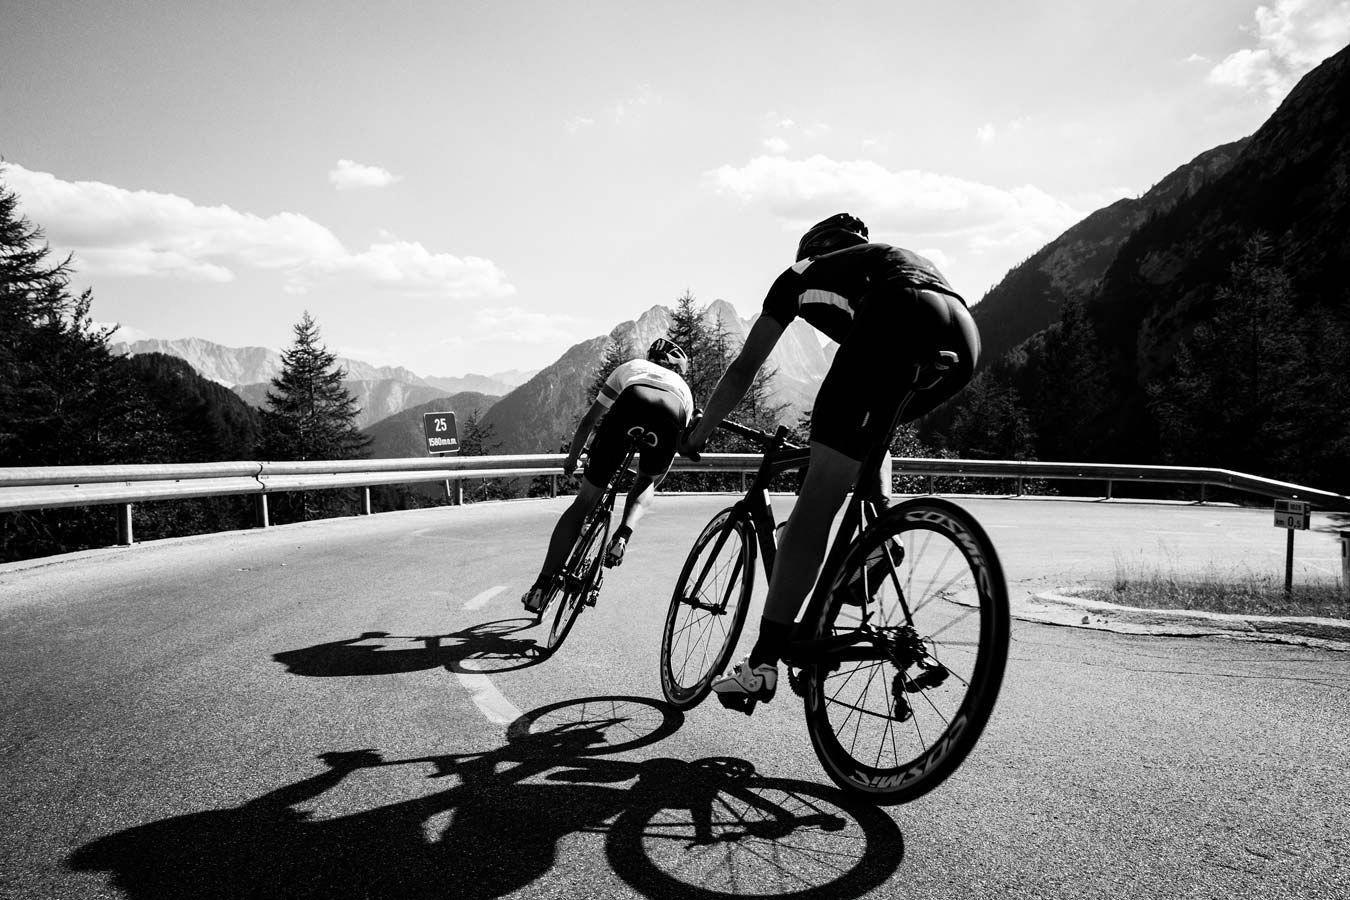 Cyclist pics #cycling #cycle #bike #bikes #cyclist #mountainbike #mountainbiking #exercise #workout...